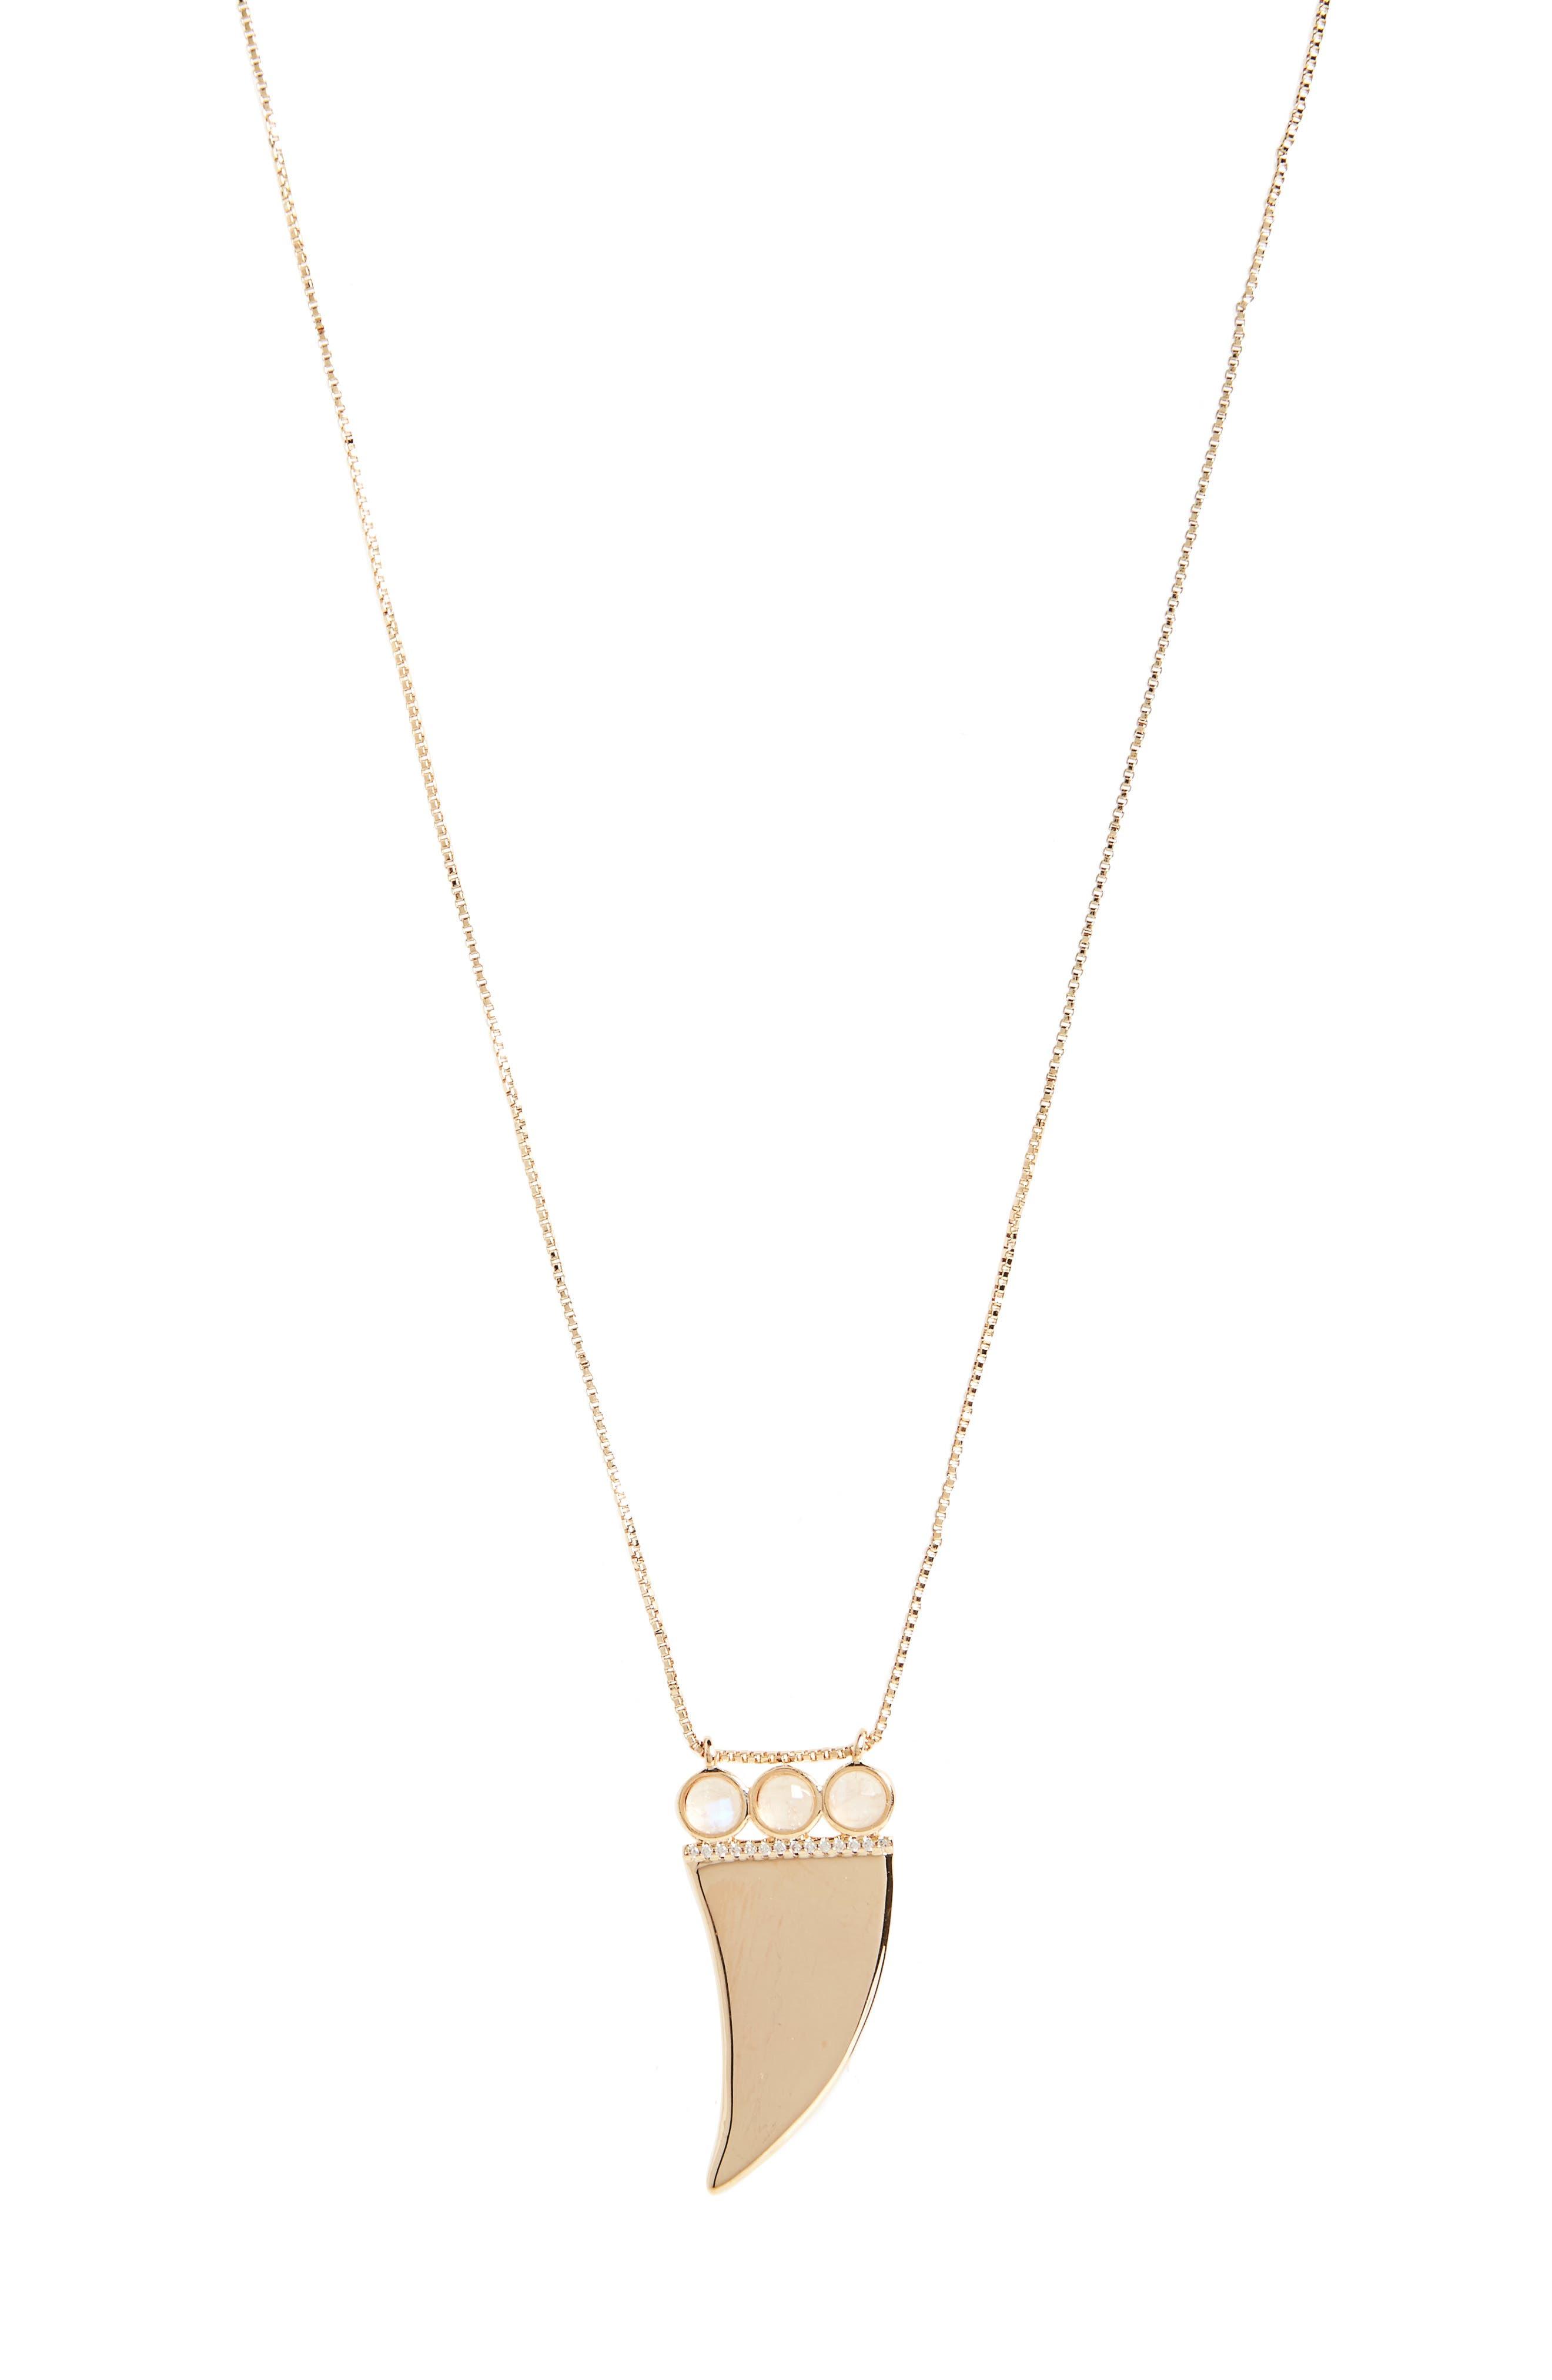 Alternate Image 1 Selected - Melanie Auld Hendrix Horn Pendant Necklace